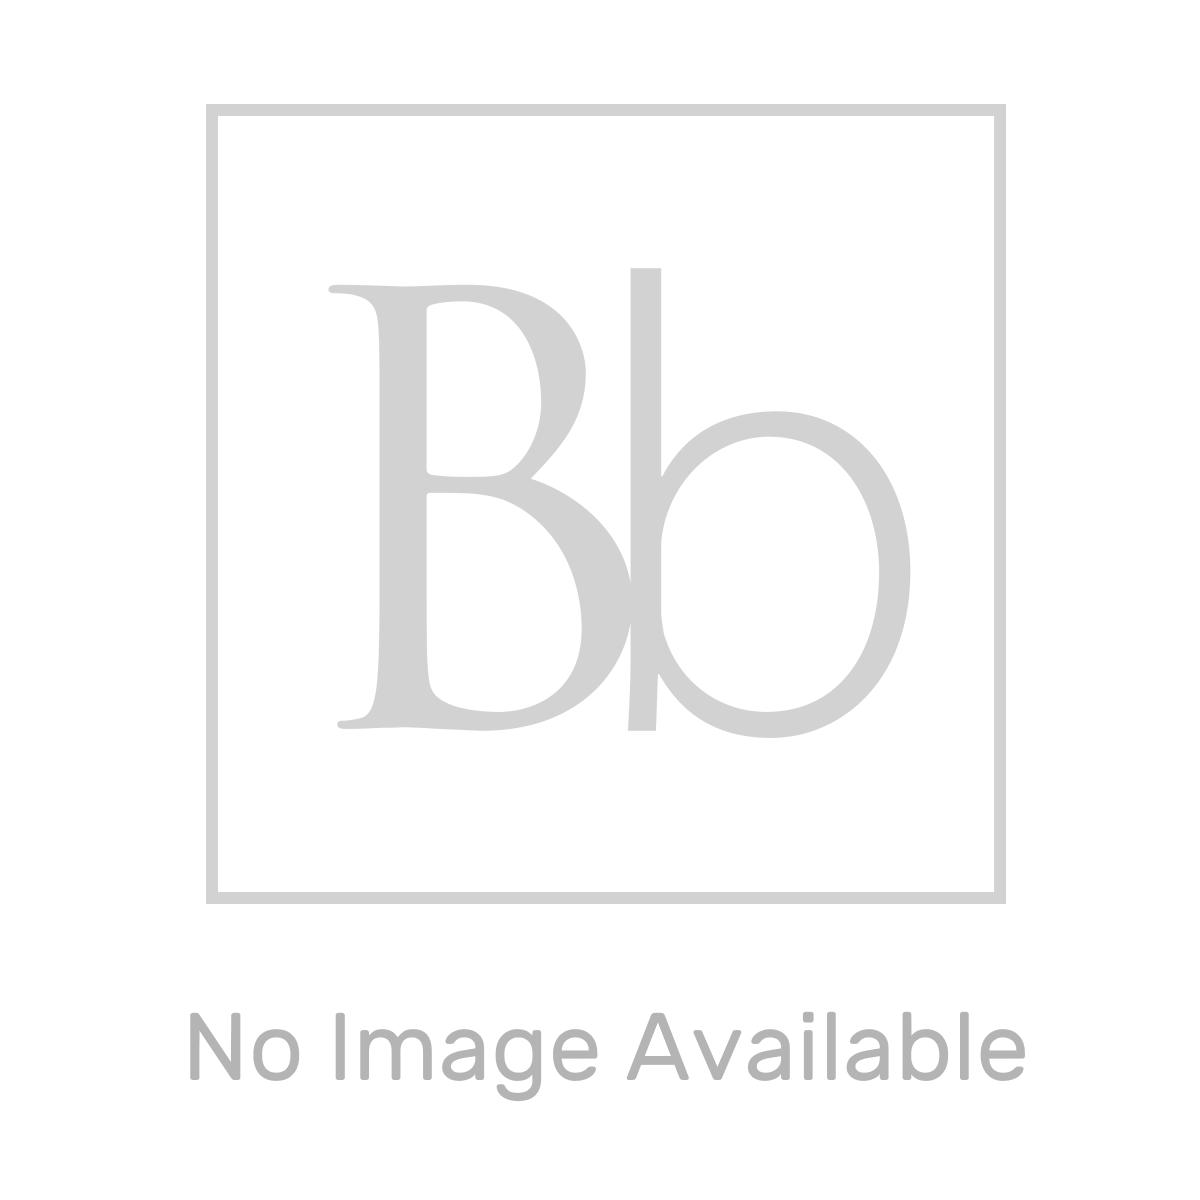 RAK Washington Cappucino Bathroom Mirror 650mm Measurements